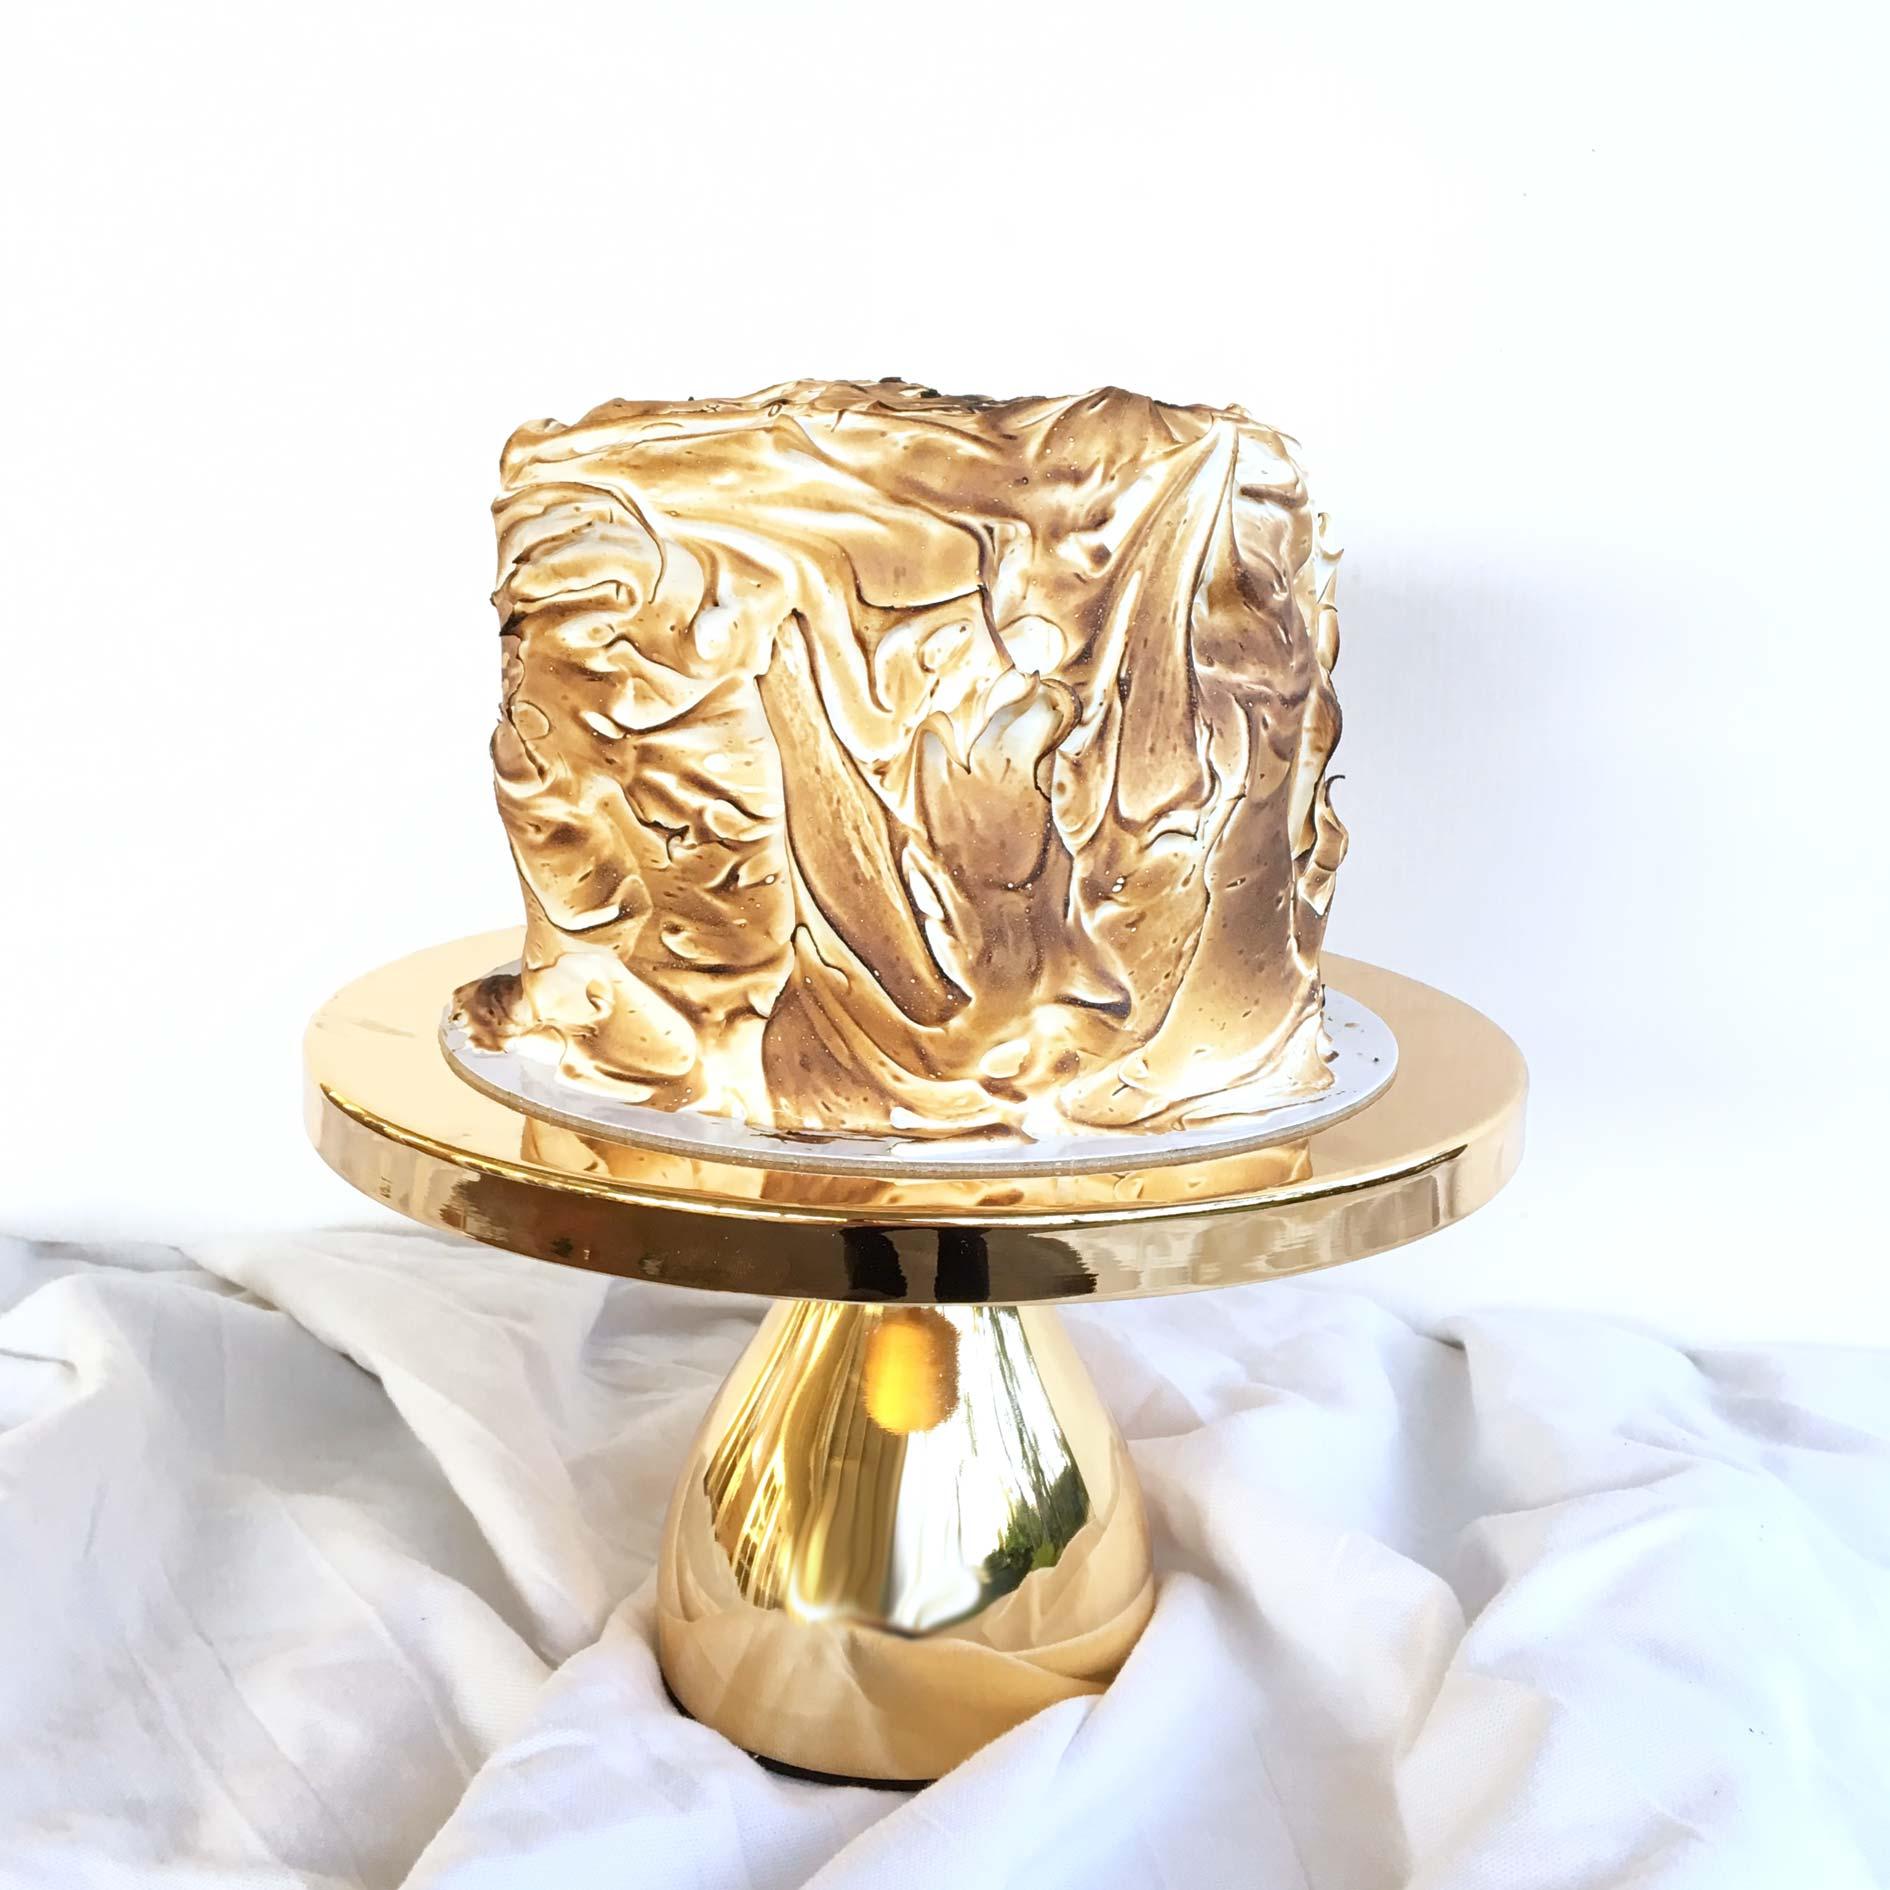 The_Little_Cake_Maker_Perth_Baker_CustomCakes_DayCakes_Slices_Tarts_Cupcakes_Day_Cakes_3.jpg